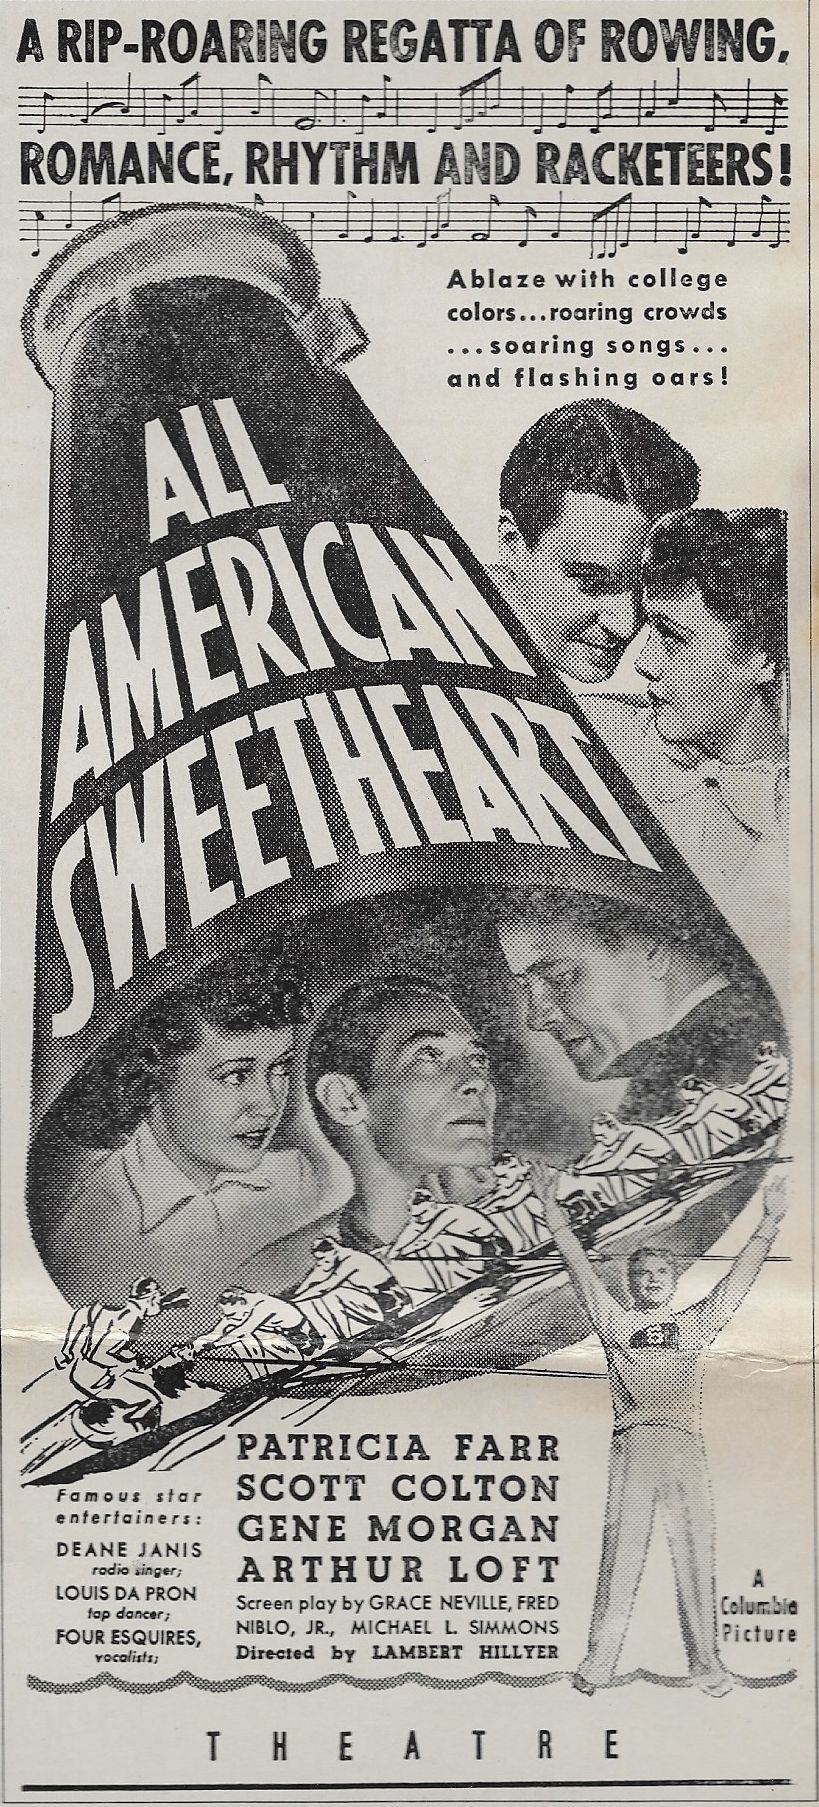 All American Sweetheart